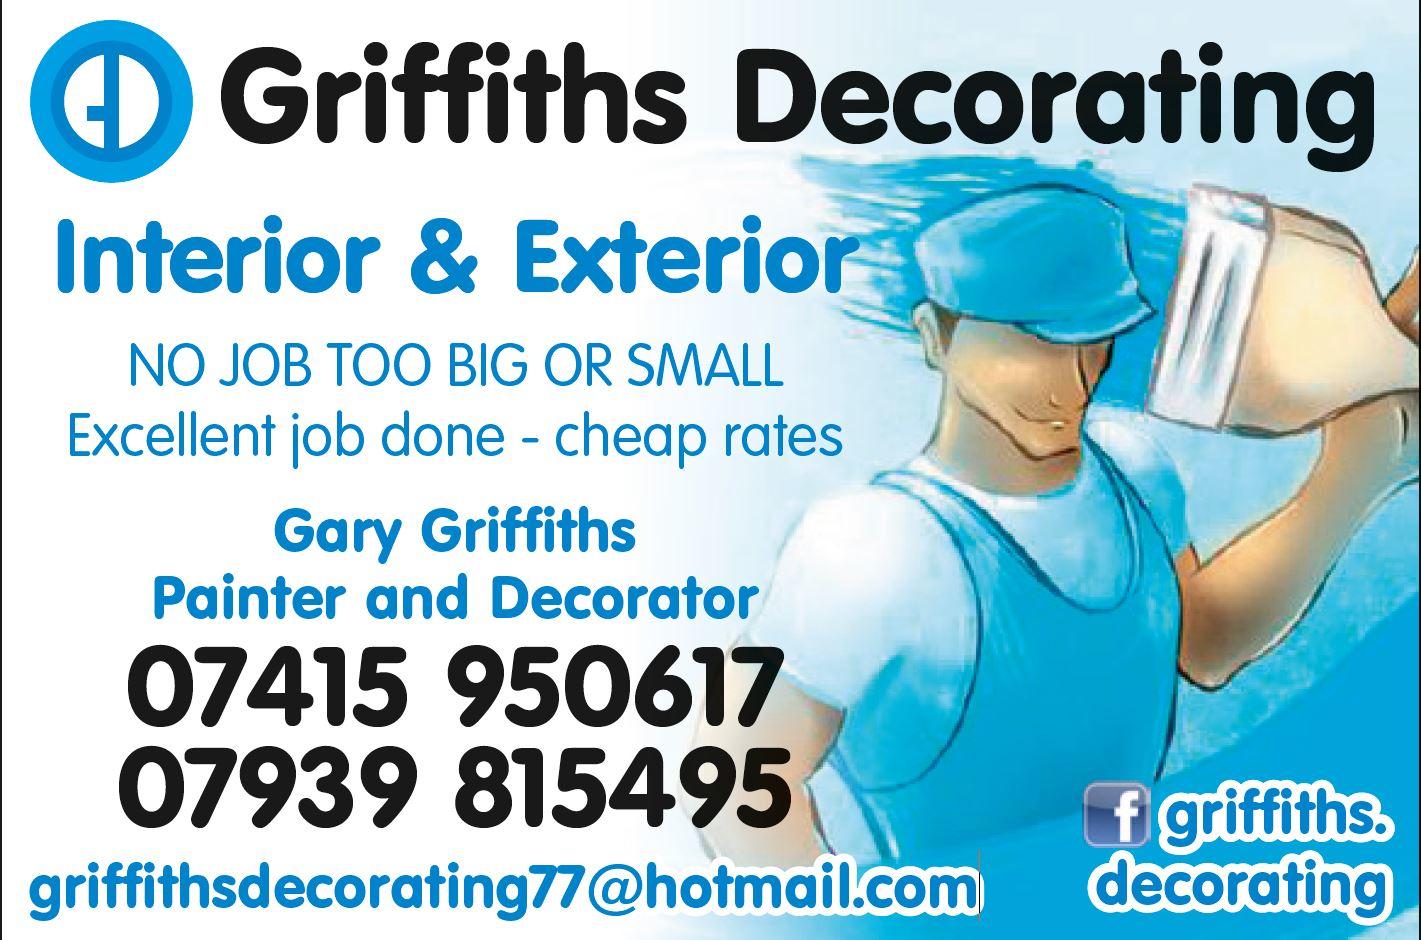 Griffi ths Decorating